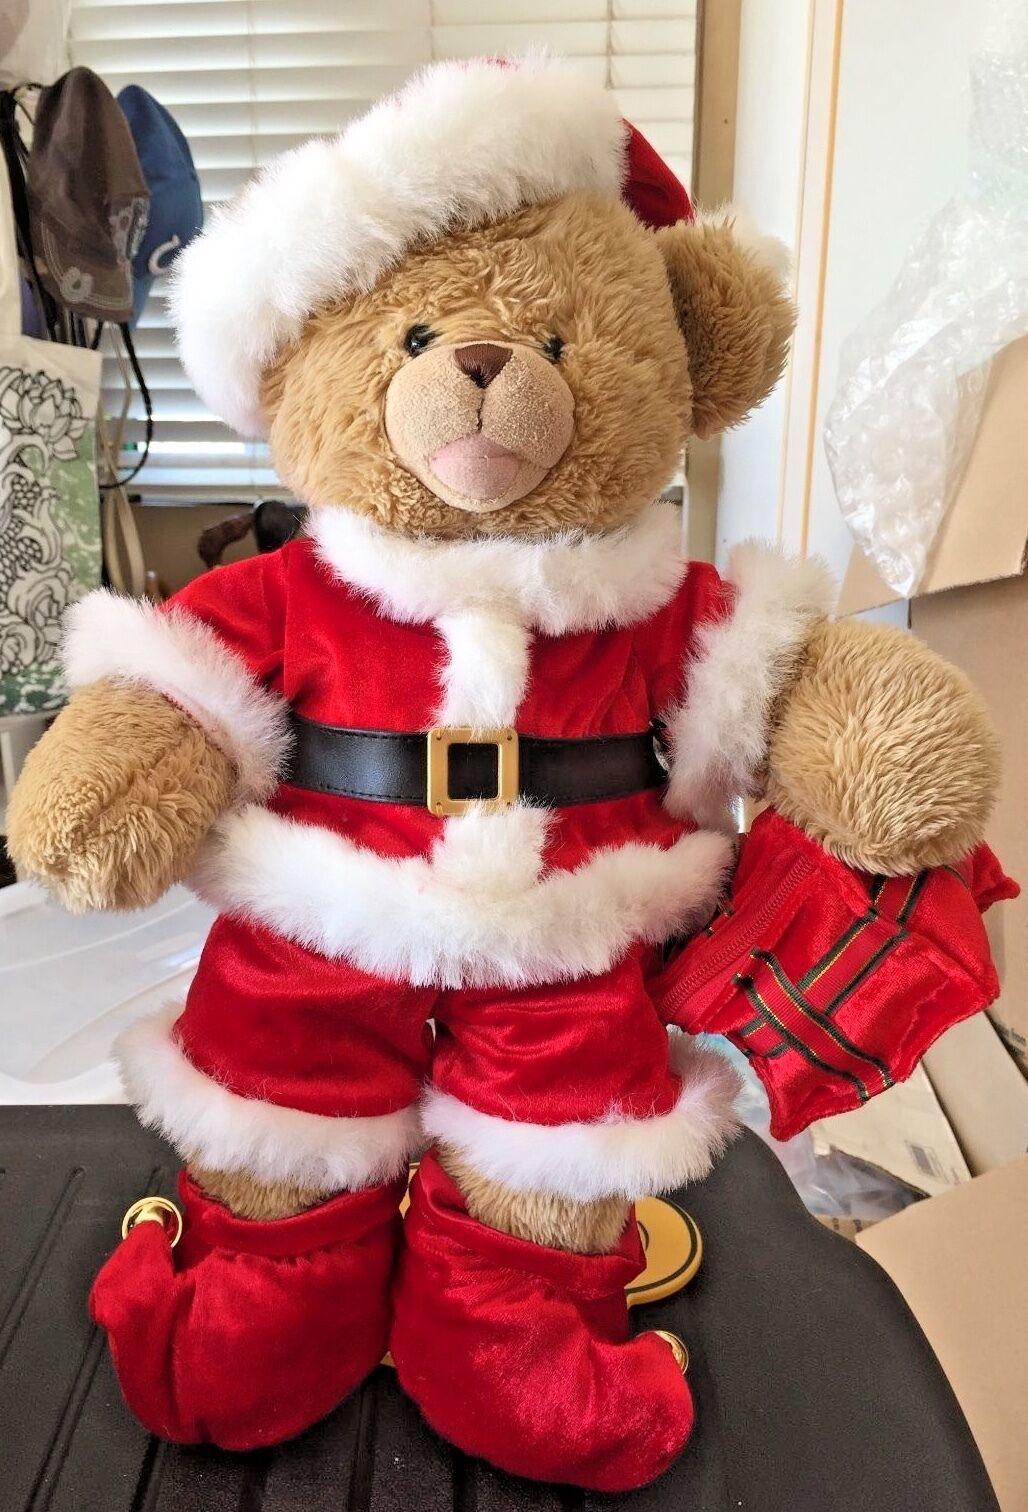 RETIrot BUILD A BEAR PLUSH WEARING SANTA CLAUS CHRISTMAS OUTFIT W ORIGINAL BOX